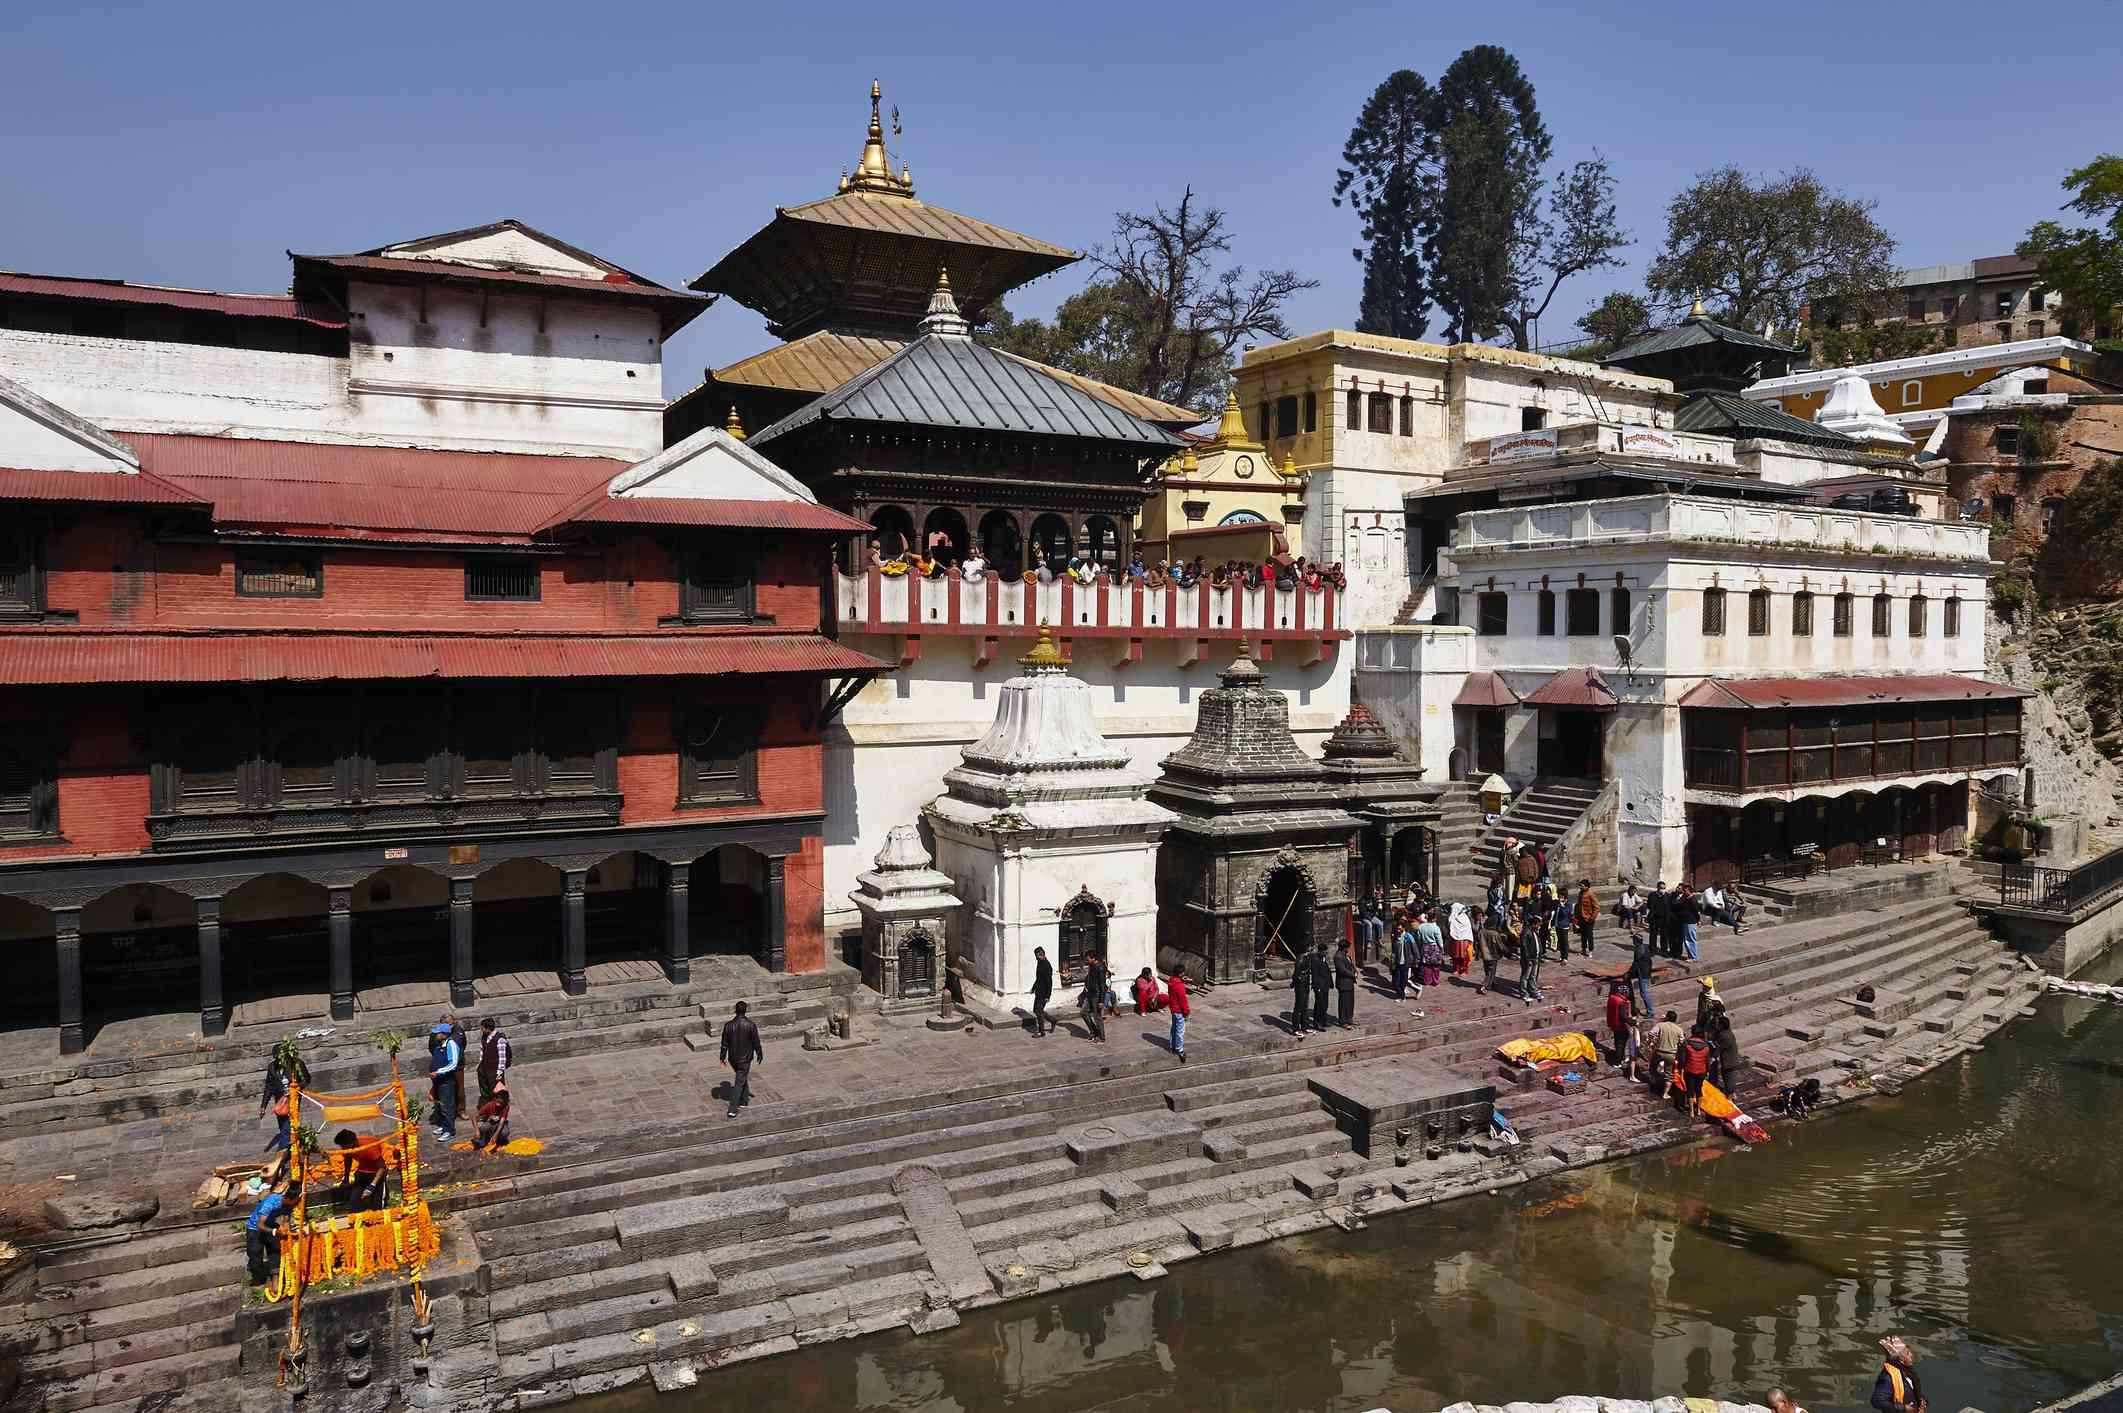 Hindu temples set beside a river